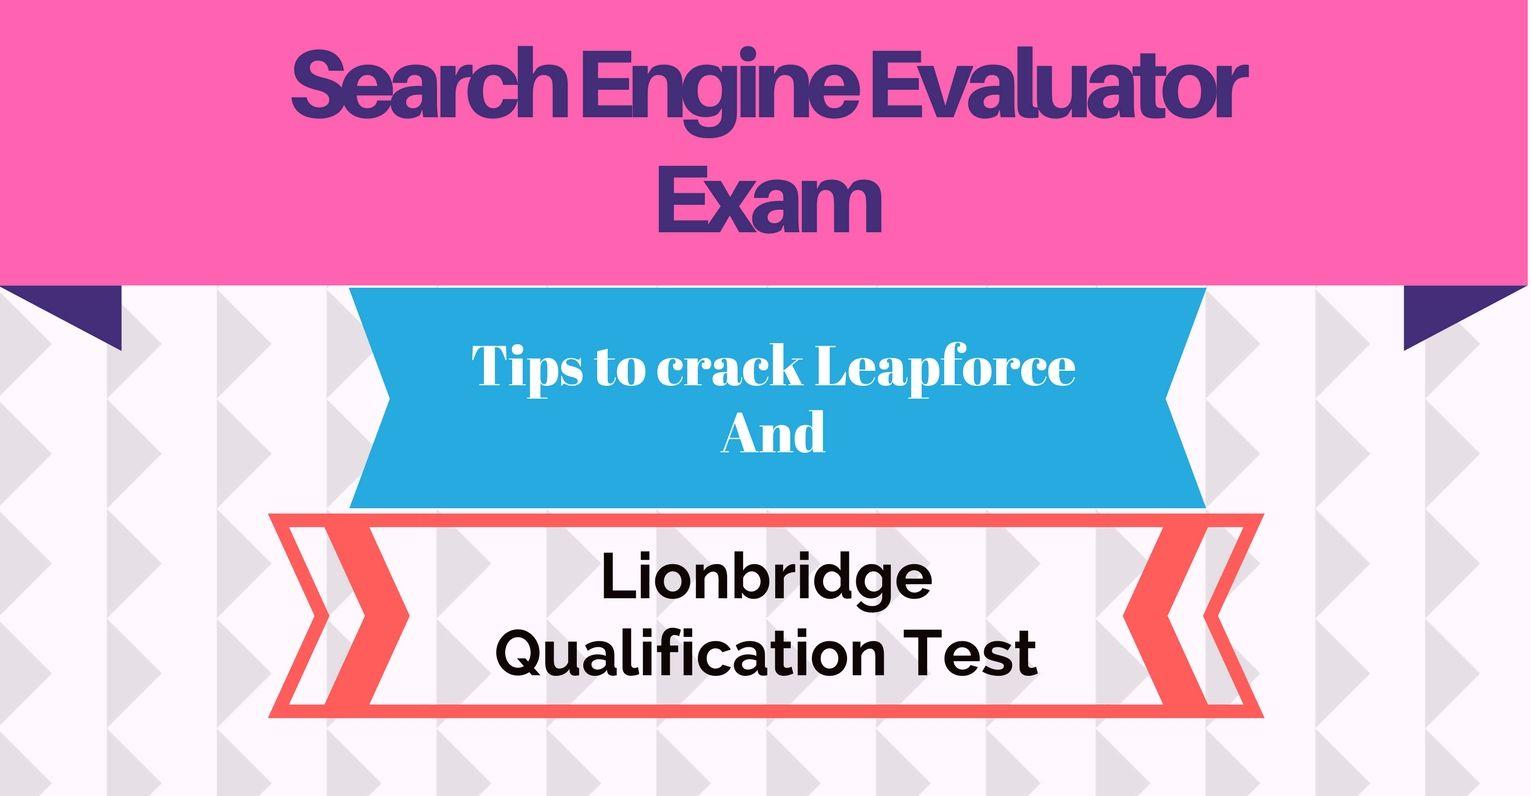 6d278238ddf59e76f67b53502a8d956e - Lionbridge Social Media Evaluator Application